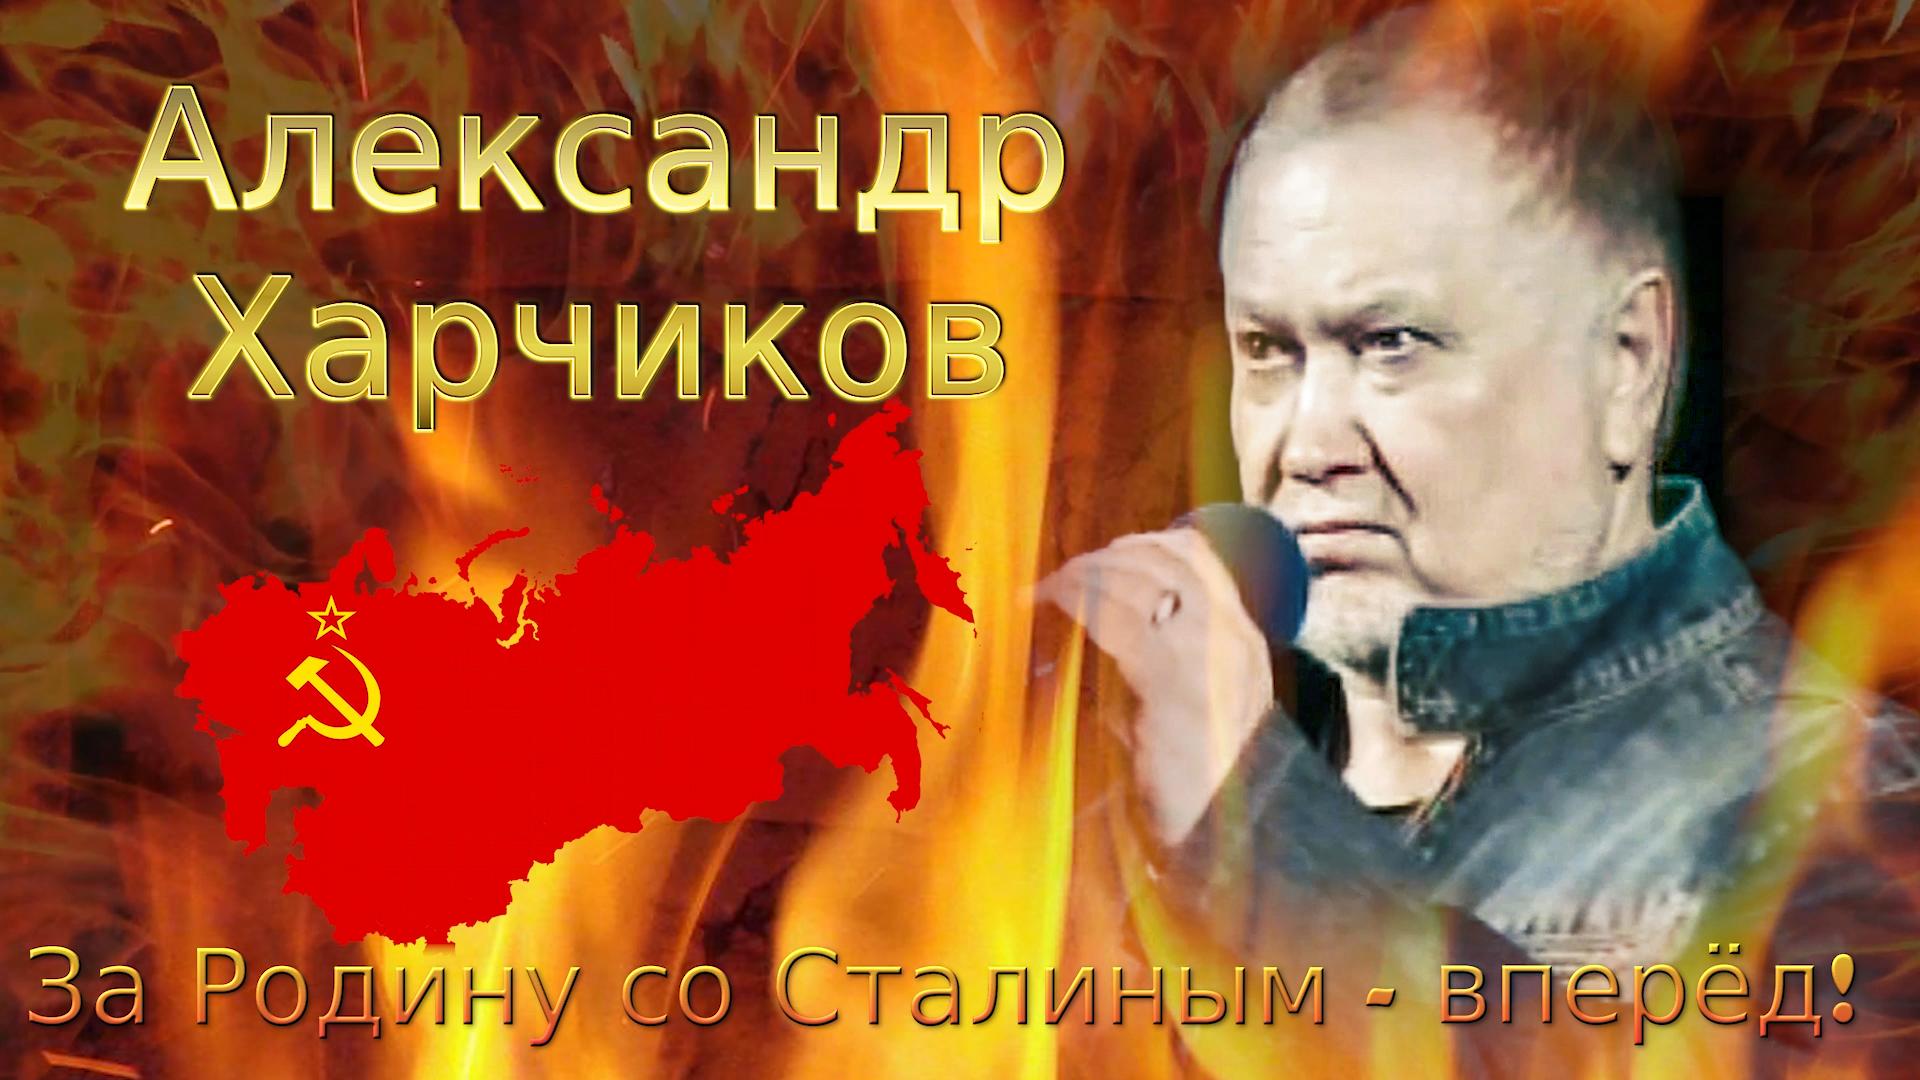 https://images.vfl.ru/ii/1522254345/2f21fd82/21151168.jpg